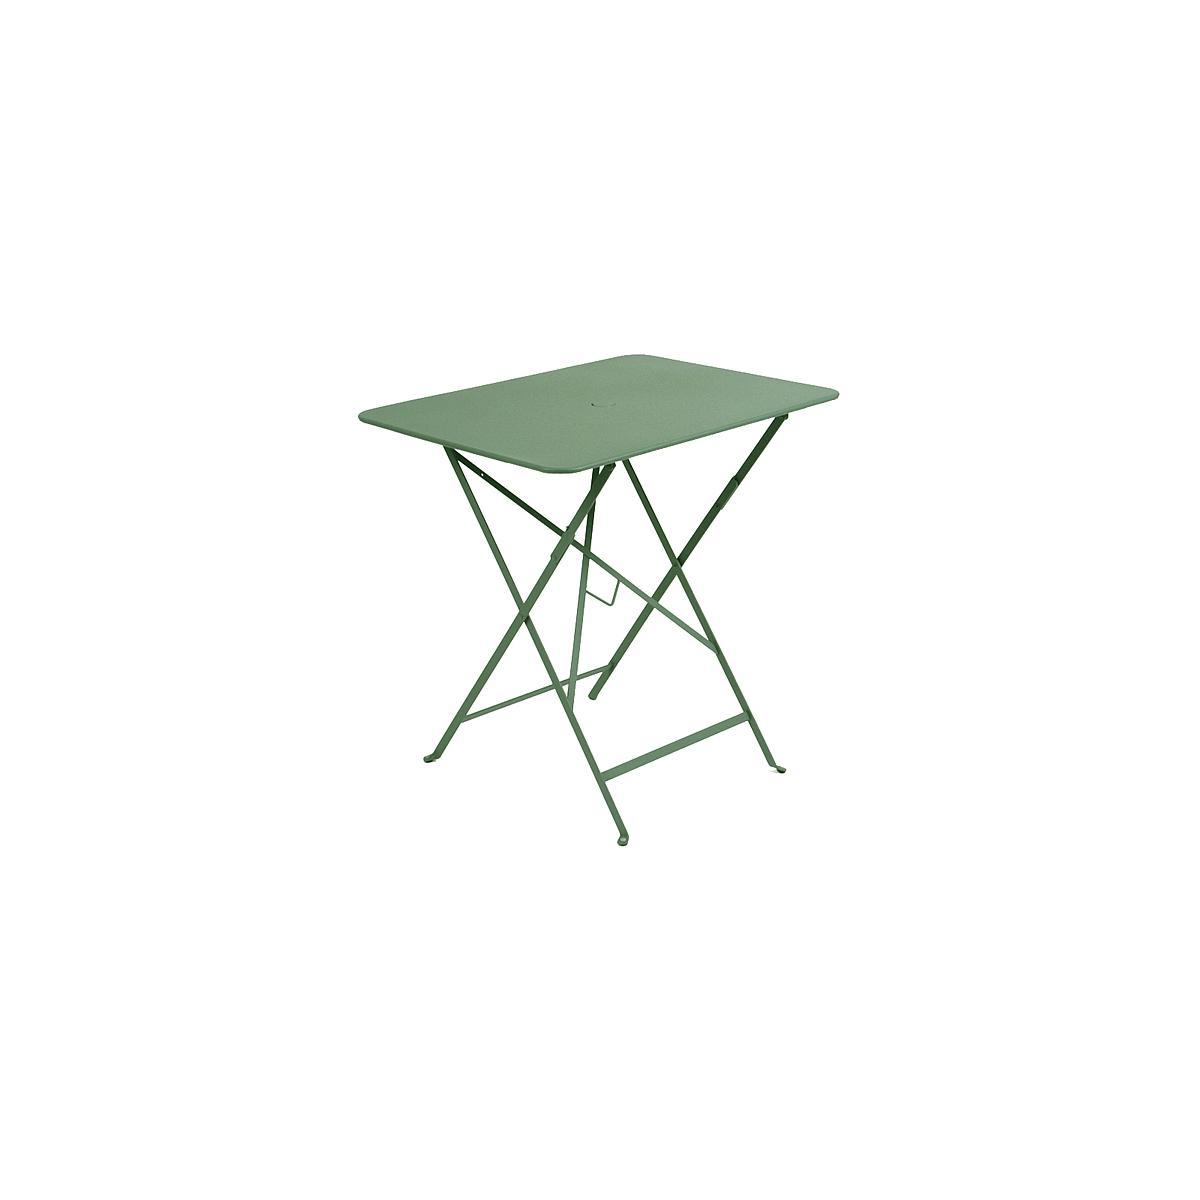 BISTRO by Fermob Table 77x55cm  Vert cèdre